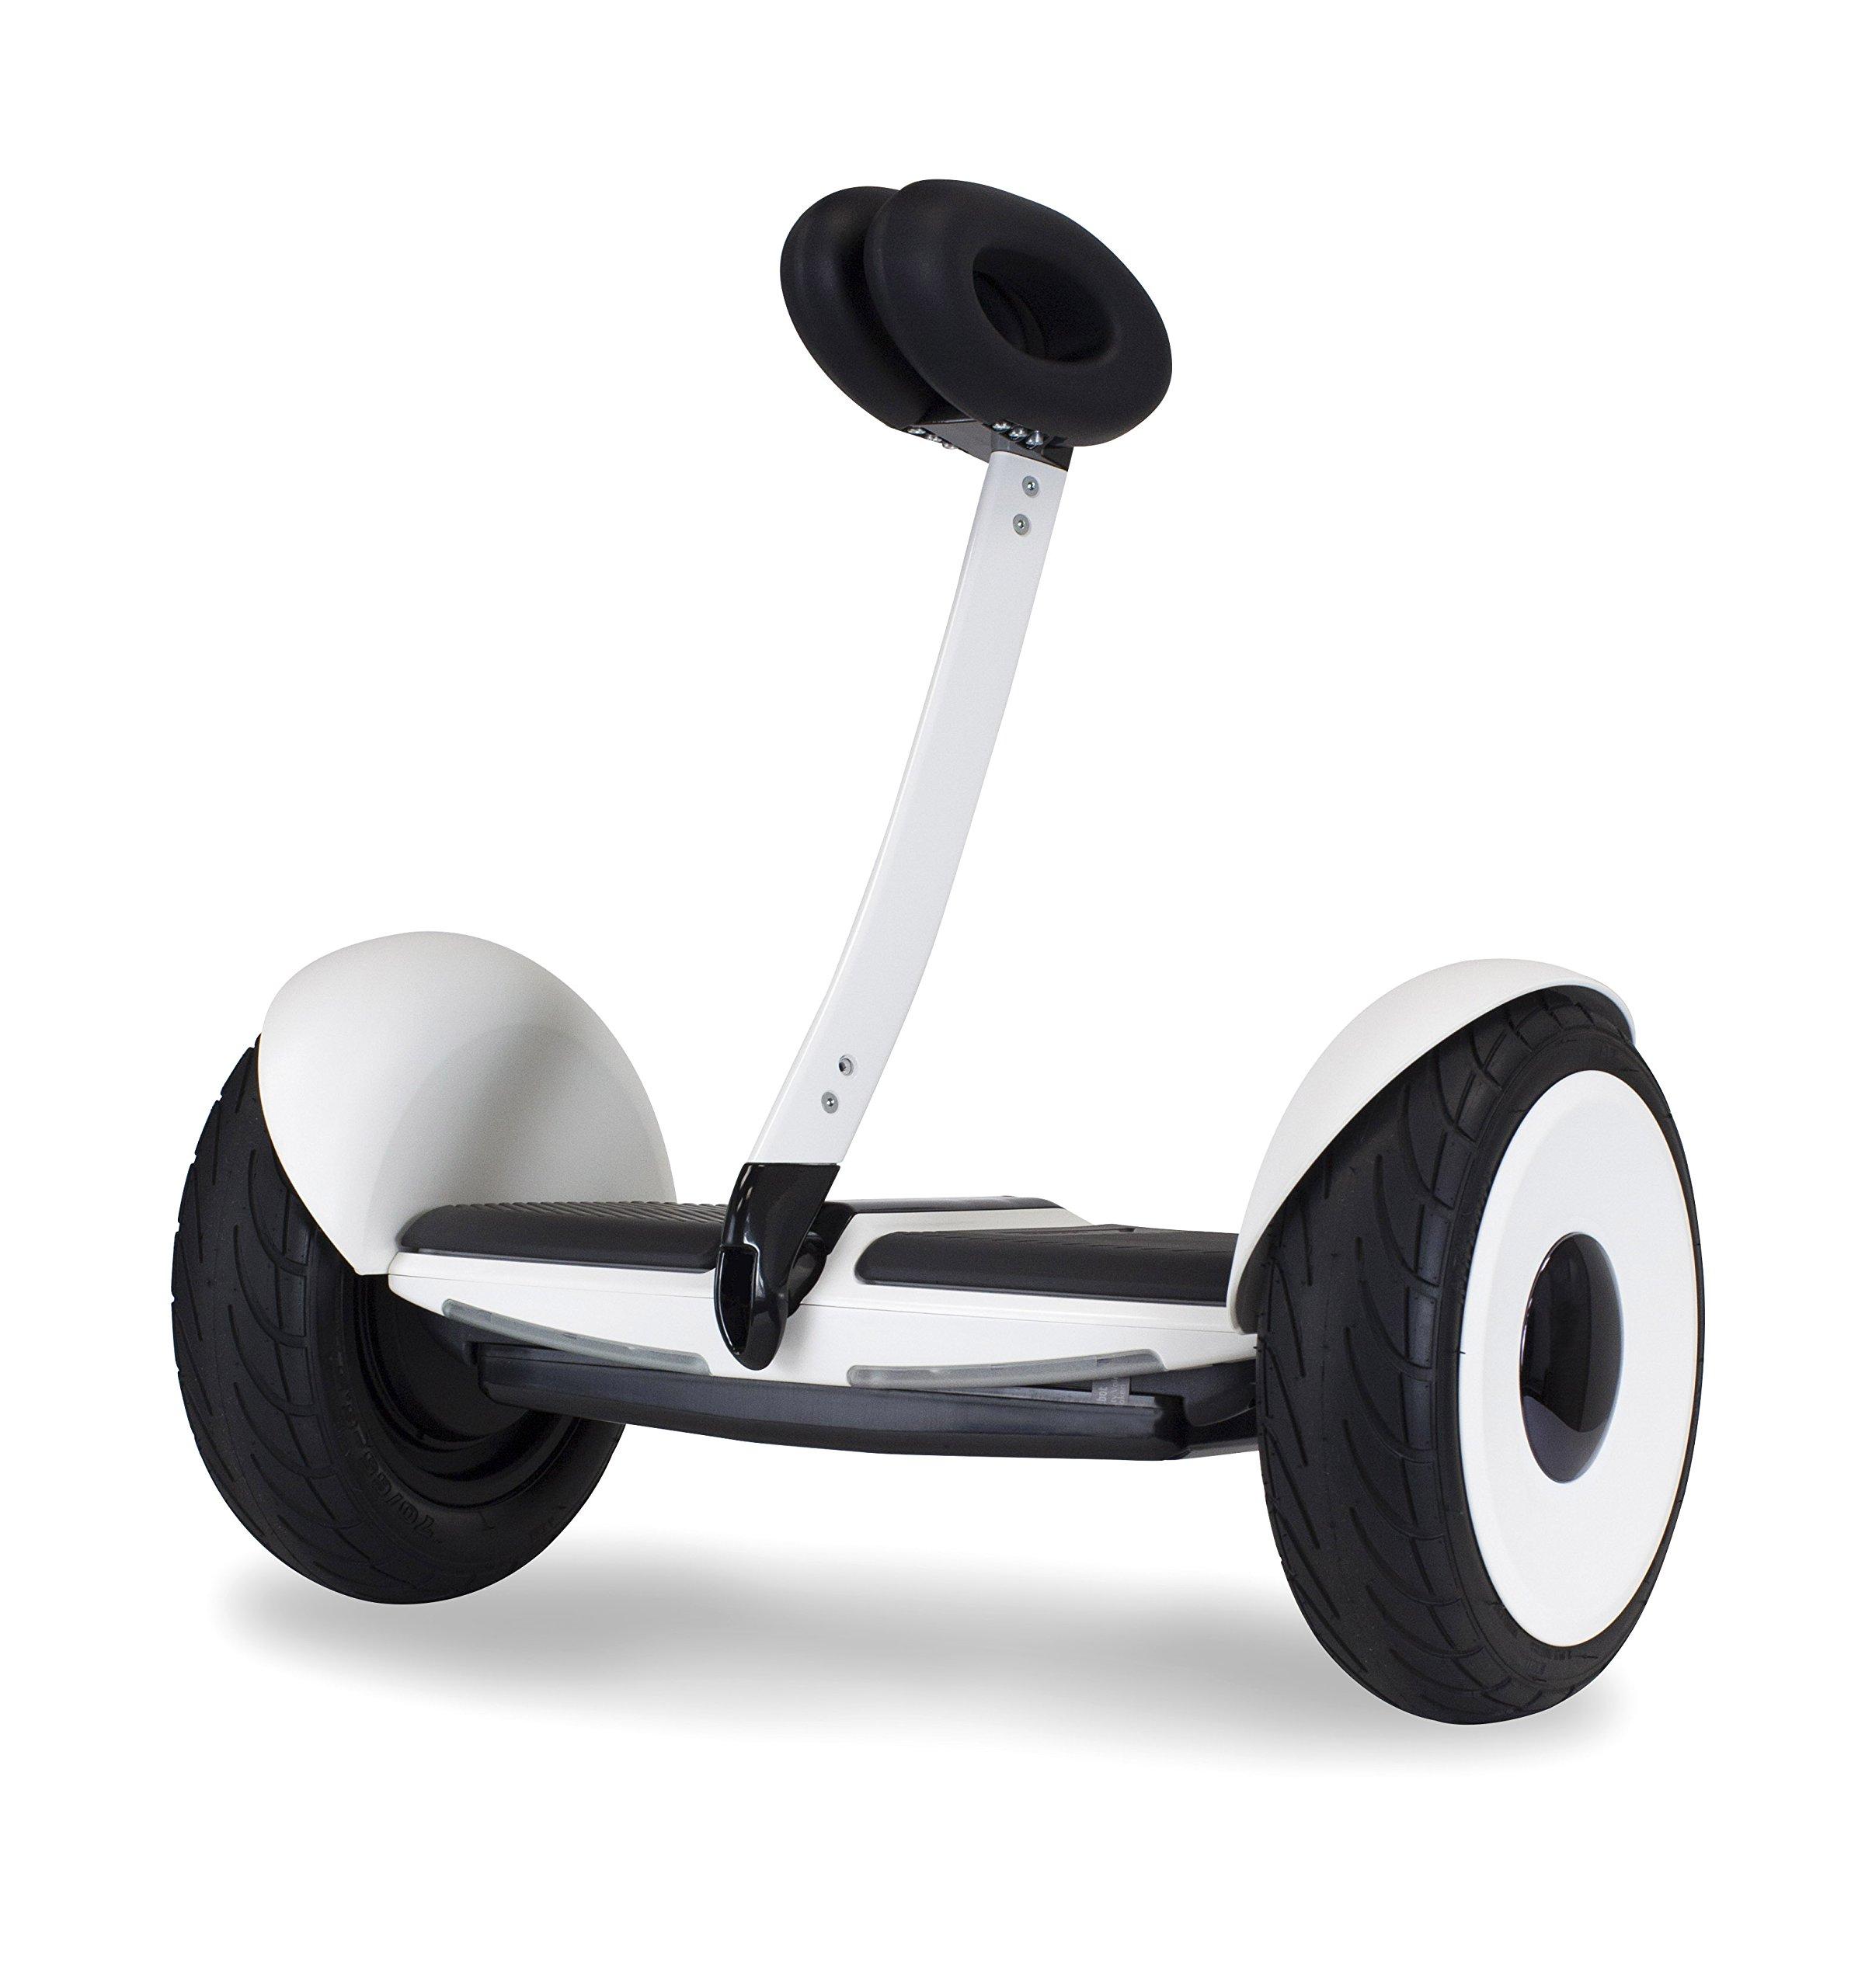 Segway miniLITE Smart Self-Balancing Electric Transporter, White by SEGWAY